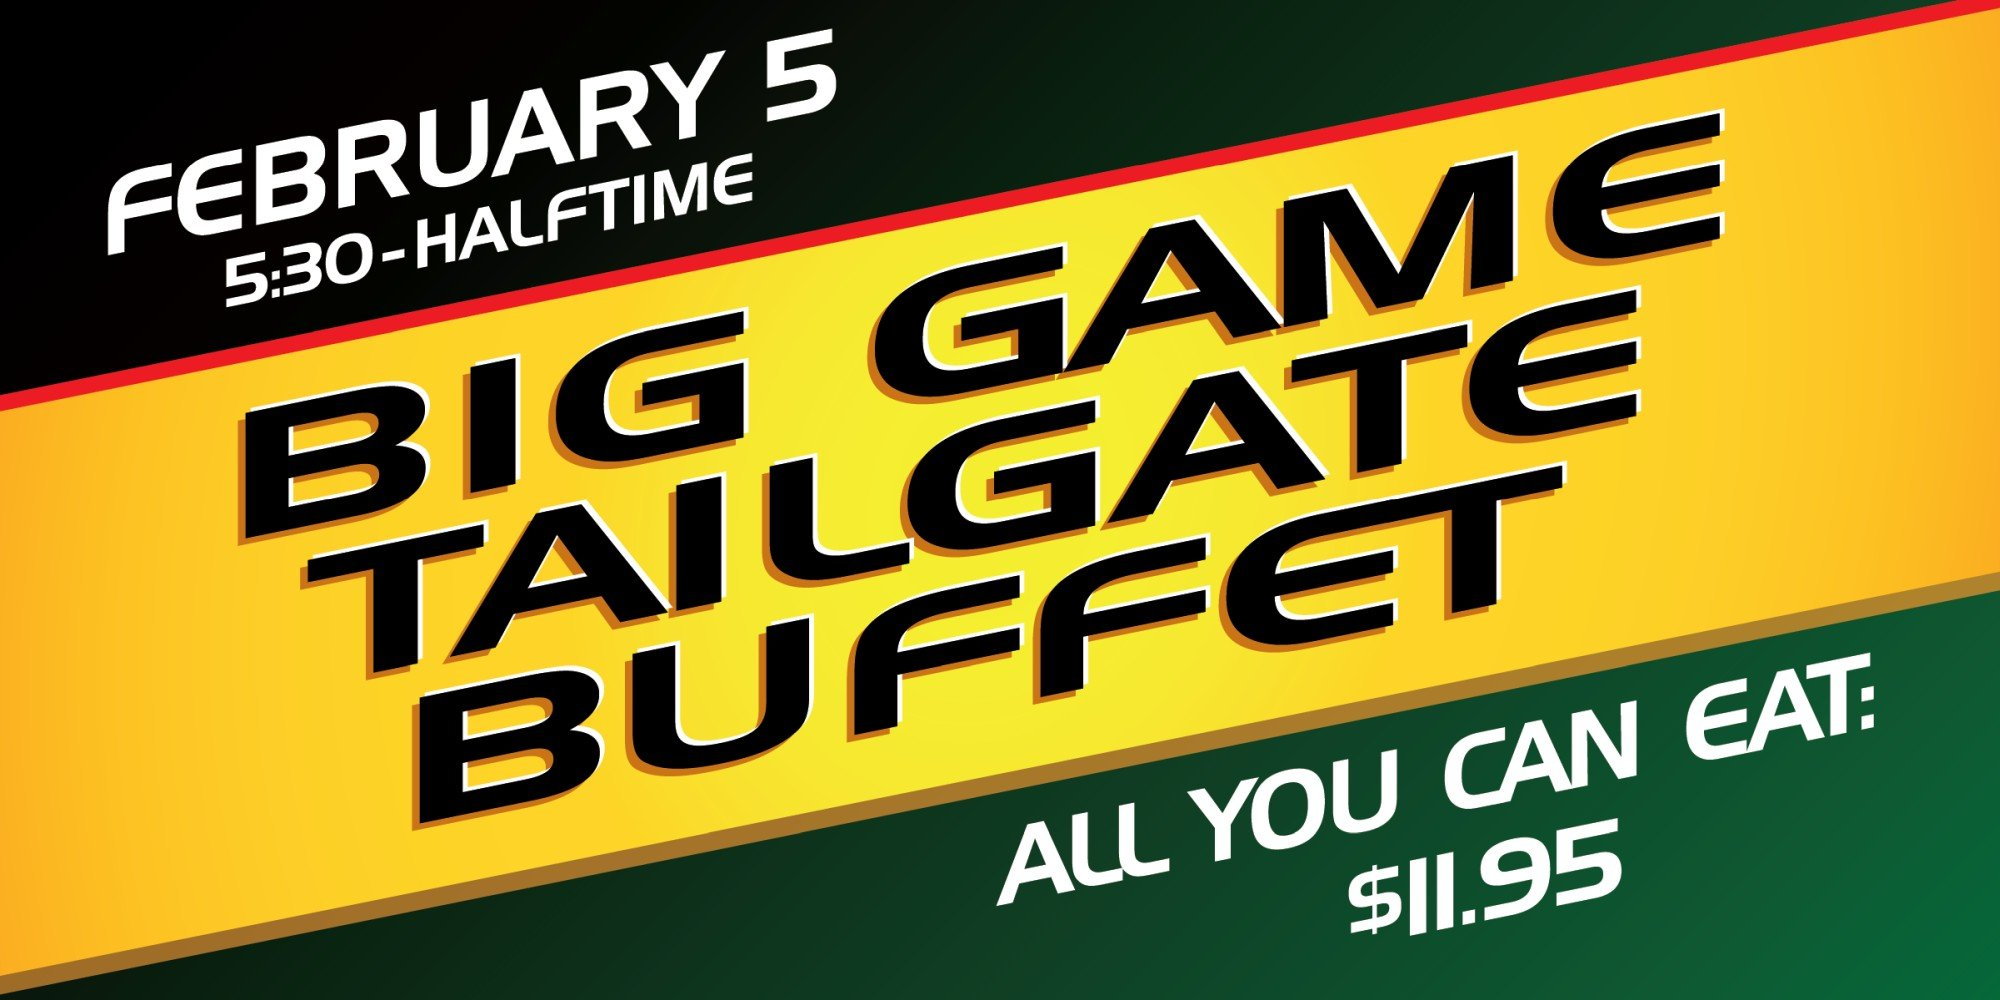 Big Game Tailgate Buffet Web Image